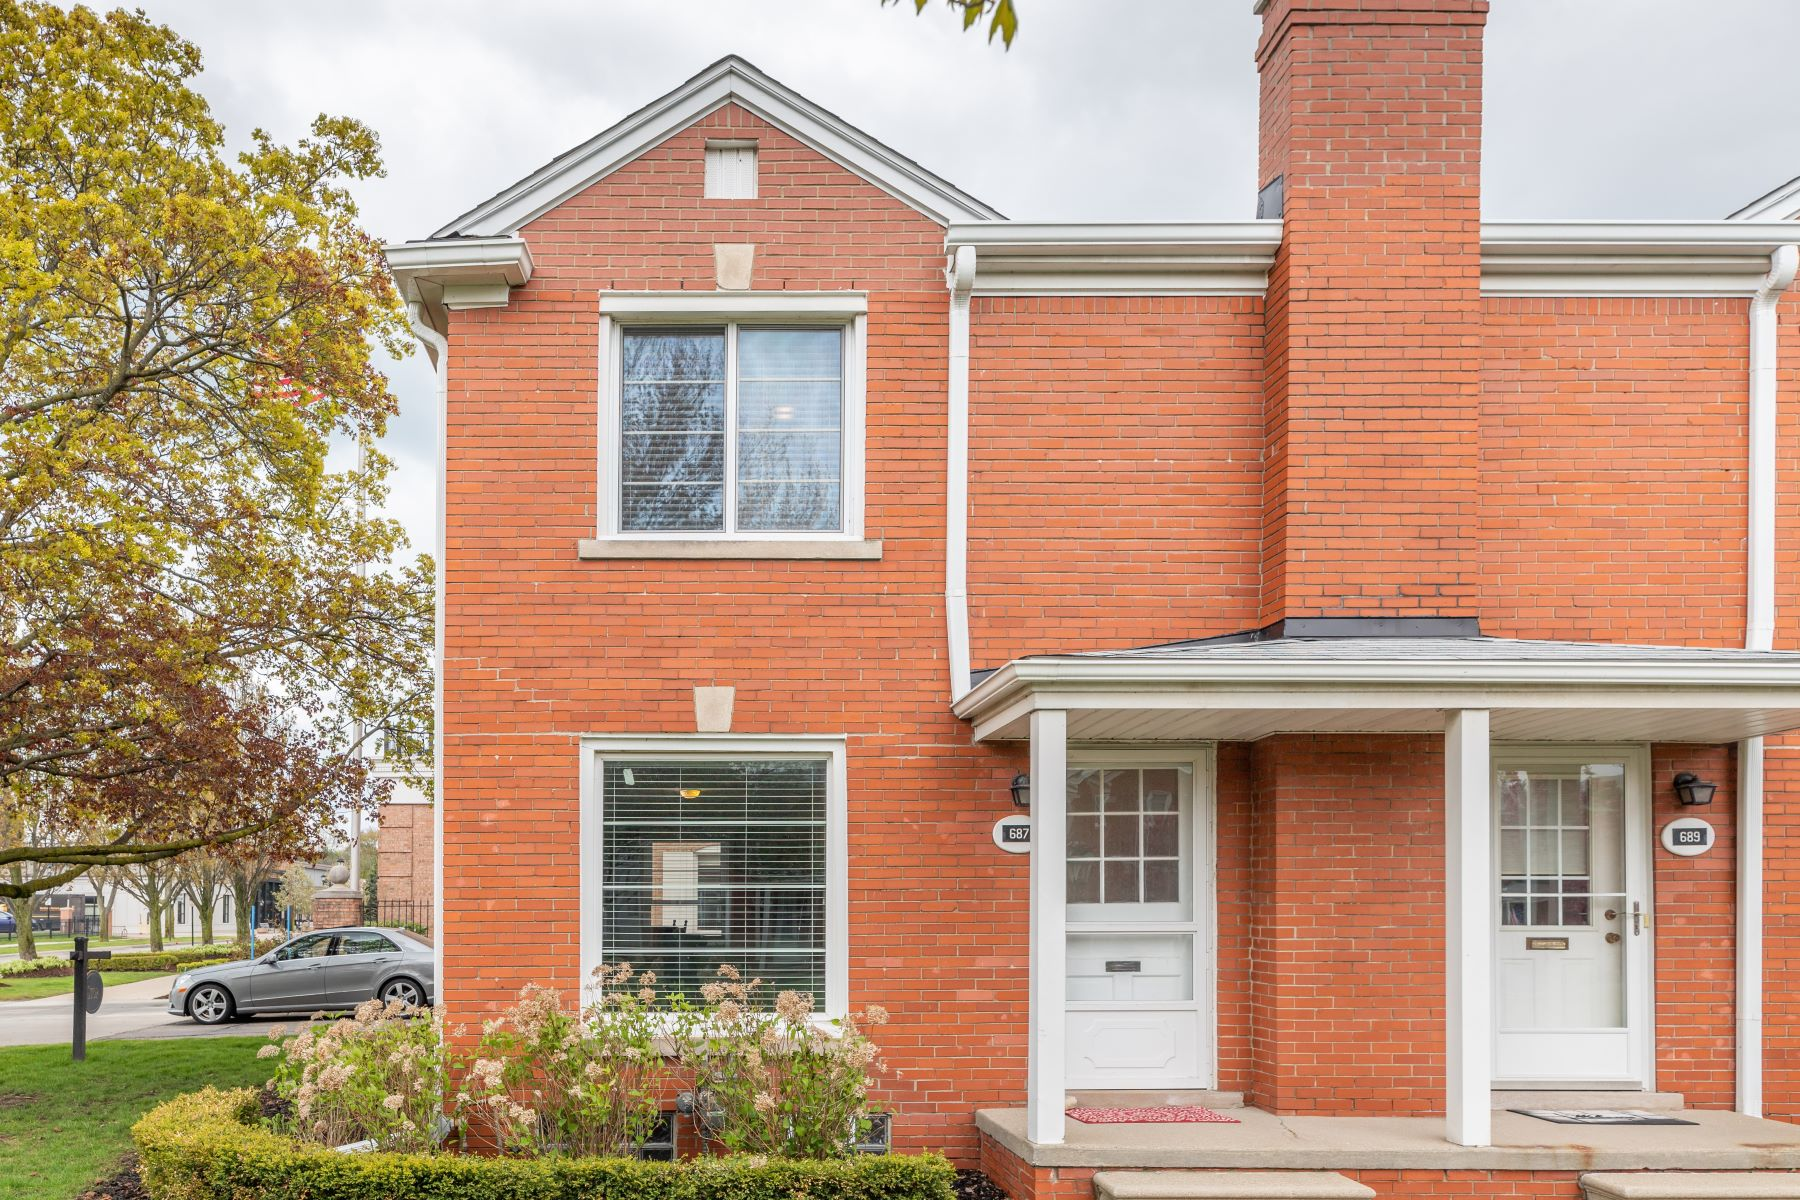 Condominiums 为 销售 在 Grosse Pointe 687 Saint Clair St Unit 687 Grosse Pointe, 密歇根州 48230 美国